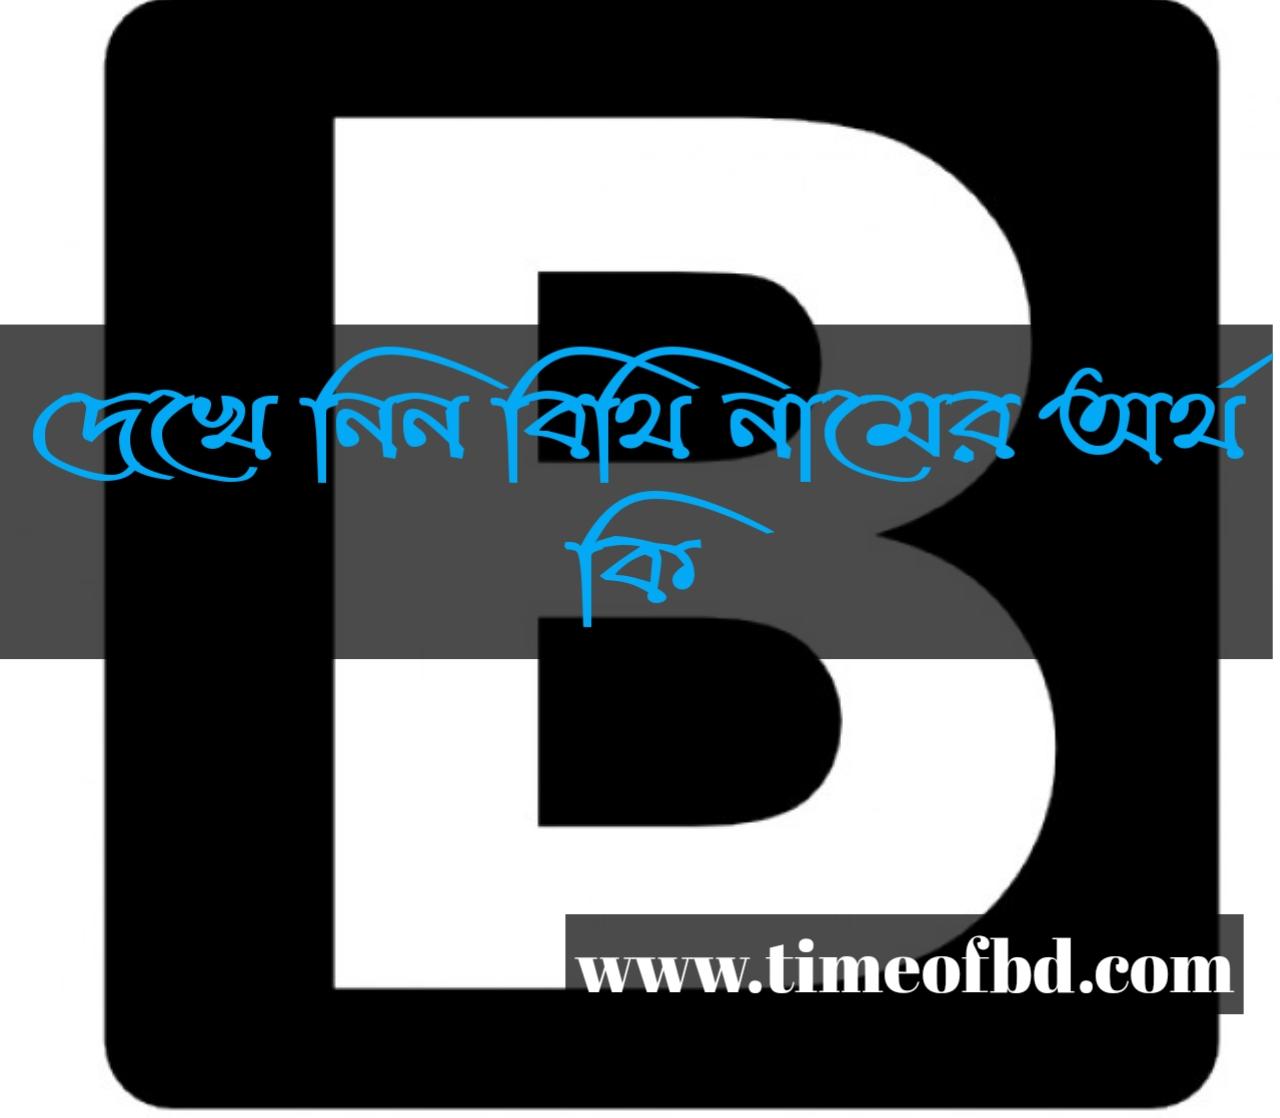 Bithi name meaning in Bengali, বিথি নামের অর্থ কি, বিথি নামের বাংলা অর্থ কি, বিথি নামের ইসলামিক অর্থ কি,